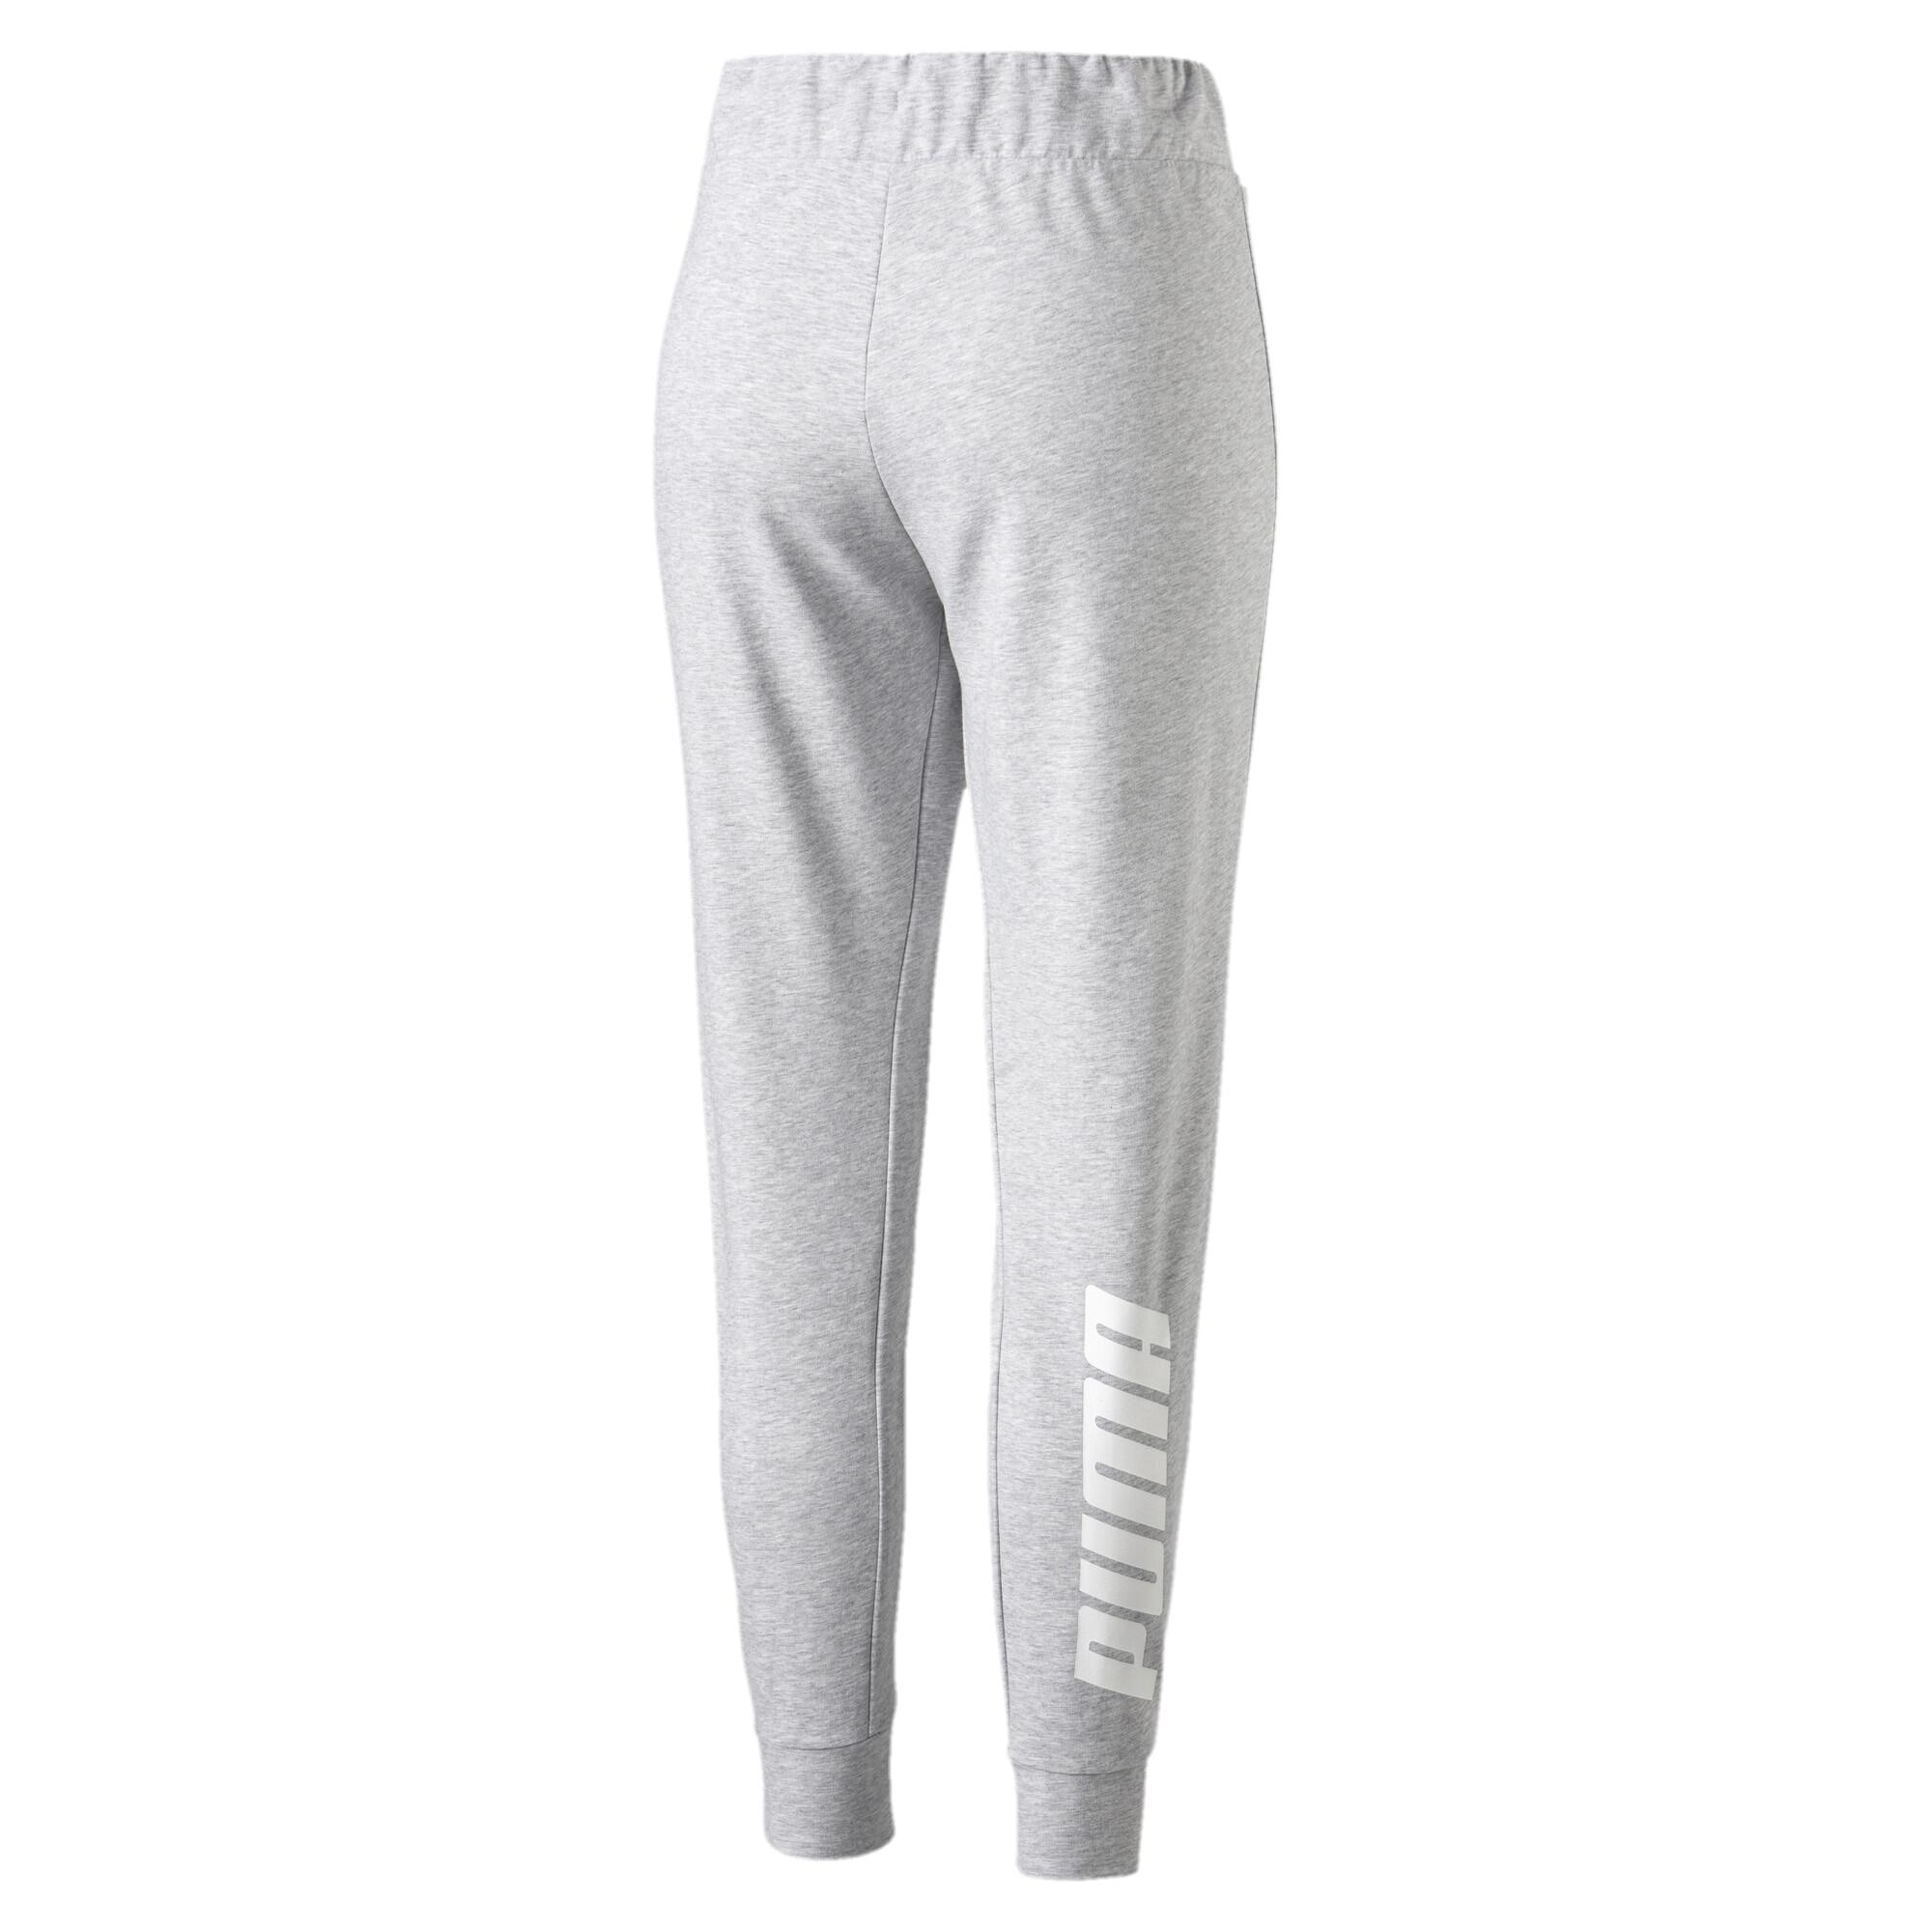 PUMA-Modern-Sports-Pants-Women-Knitted-Pants-Basics thumbnail 8